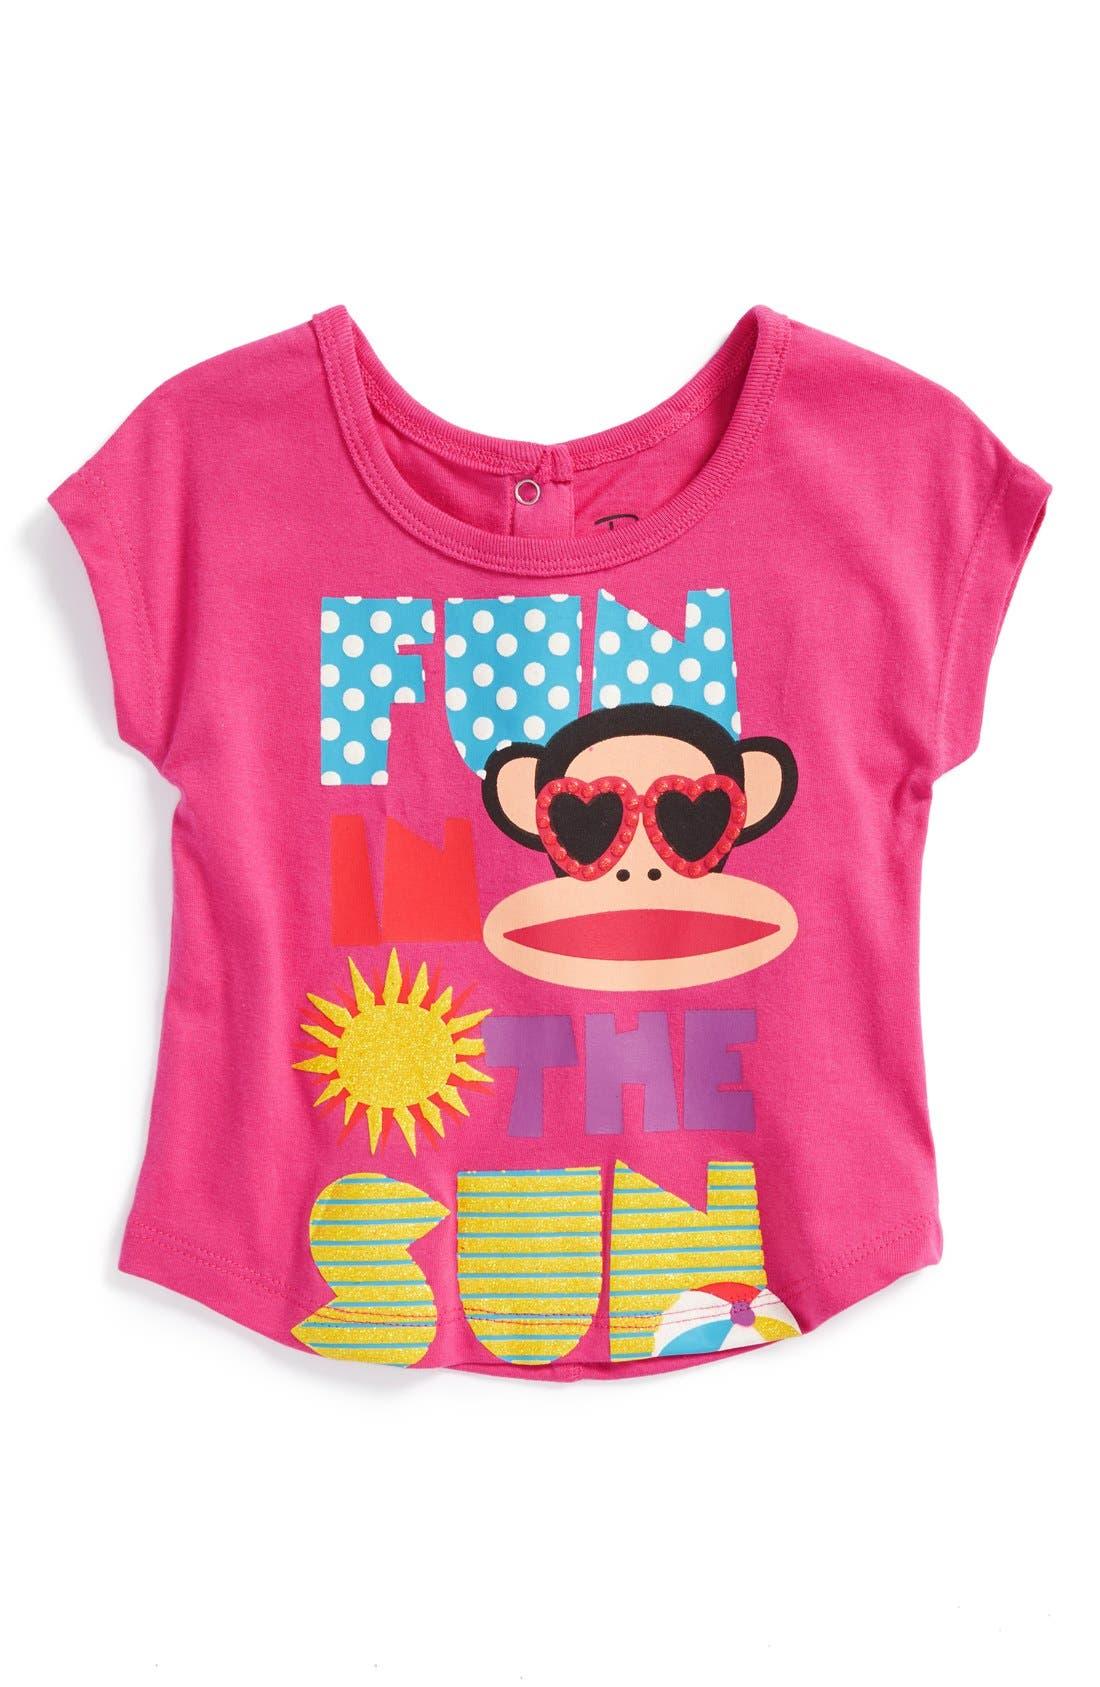 Main Image - Paul Frank 'Fun in the Sun' Graphic Tee (Baby Girls)